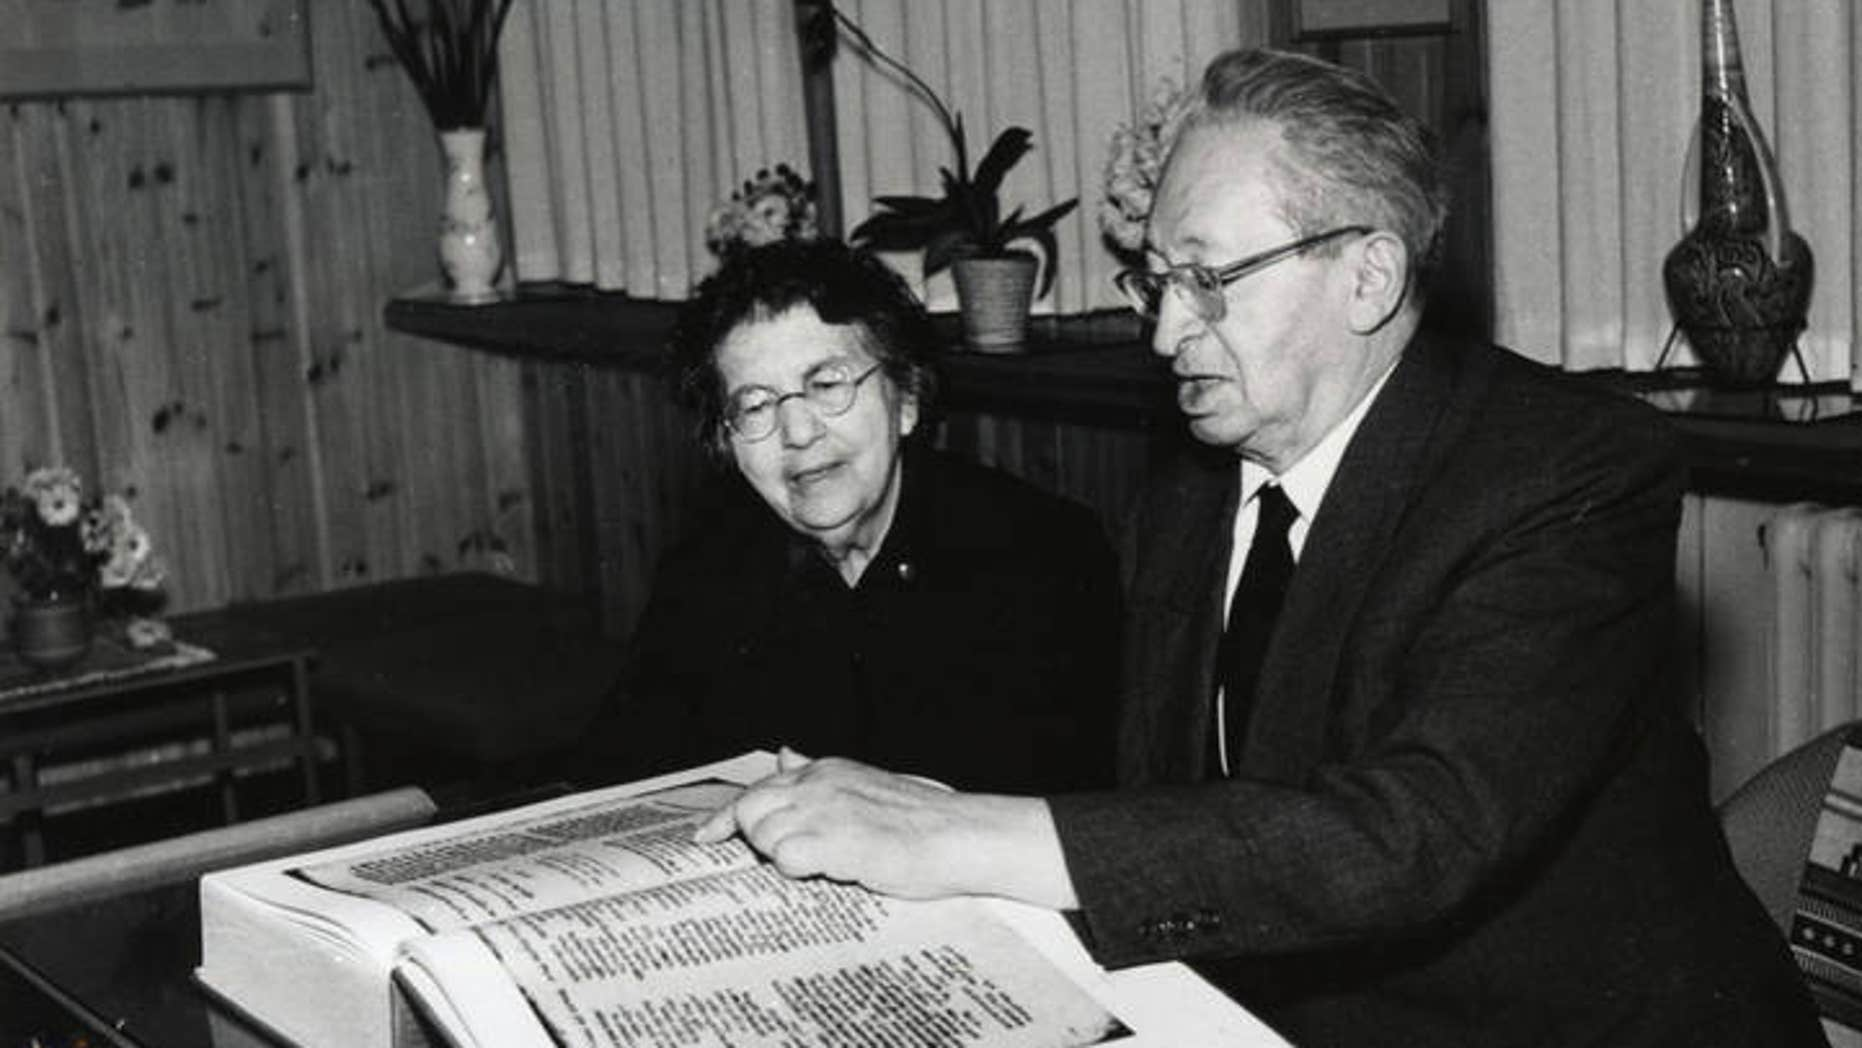 The late president of Israel, Izhak Ben-Zvi, and his wife, Rachel Yanait Ben Zvi, examining a facsimile copy of the Aleppo Codex. (UNESCO)